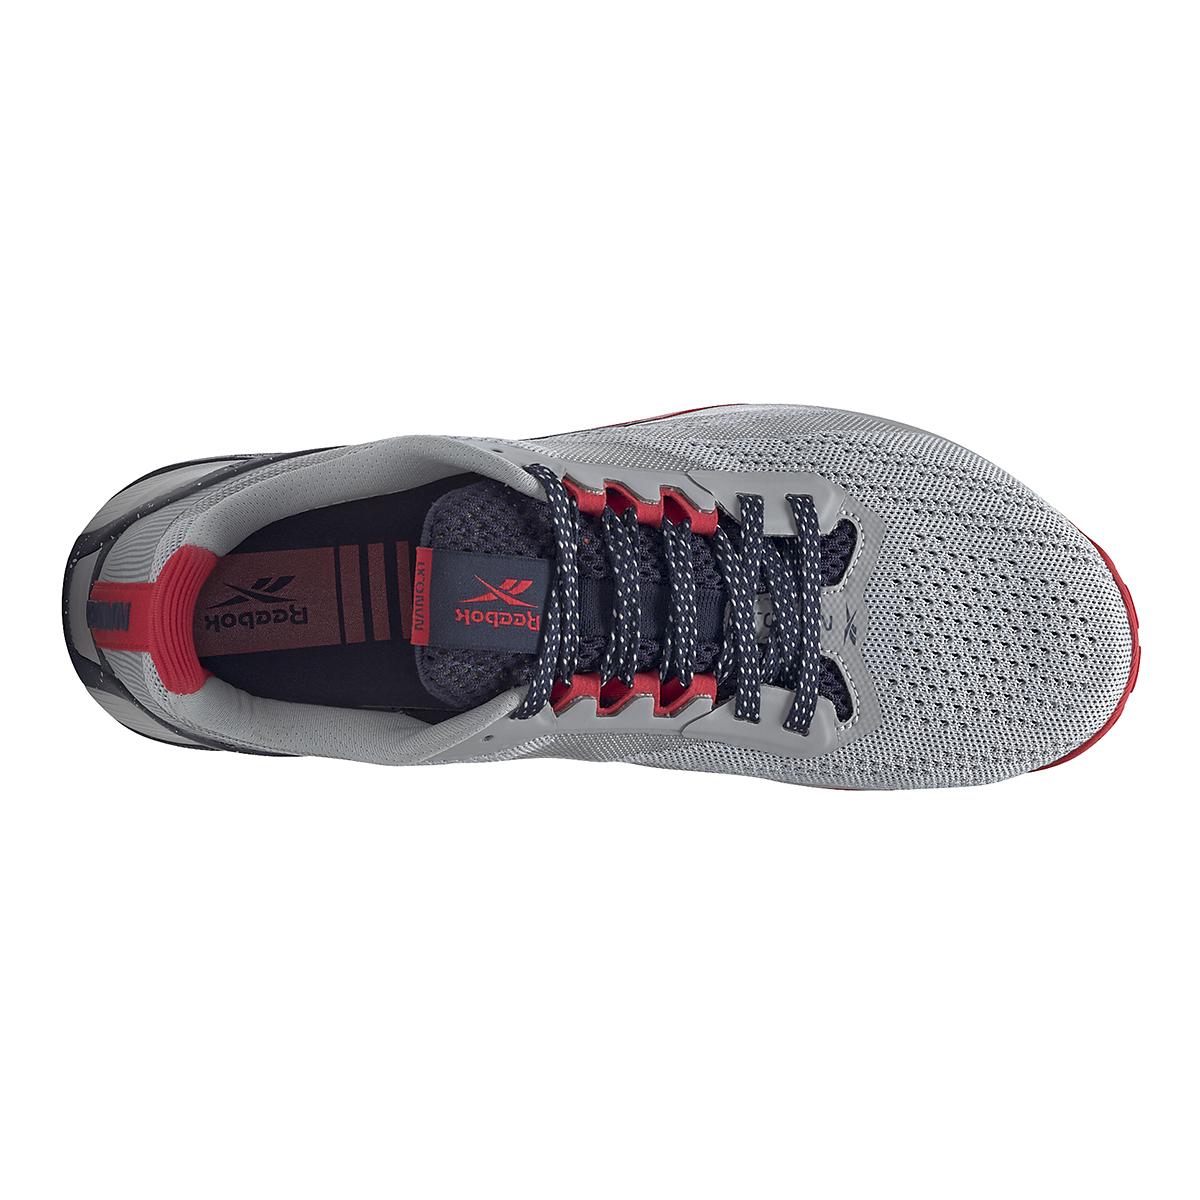 Men's Reebok Nano X1 Training Shoe - Color: Pure Grey/Vector Navy/Vector Red - JackRabbit Exclusive - Size: 8 - Width: Regular, Pure Grey/Vector Navy/Vector Red - JackRabbit Exclusive, large, image 2